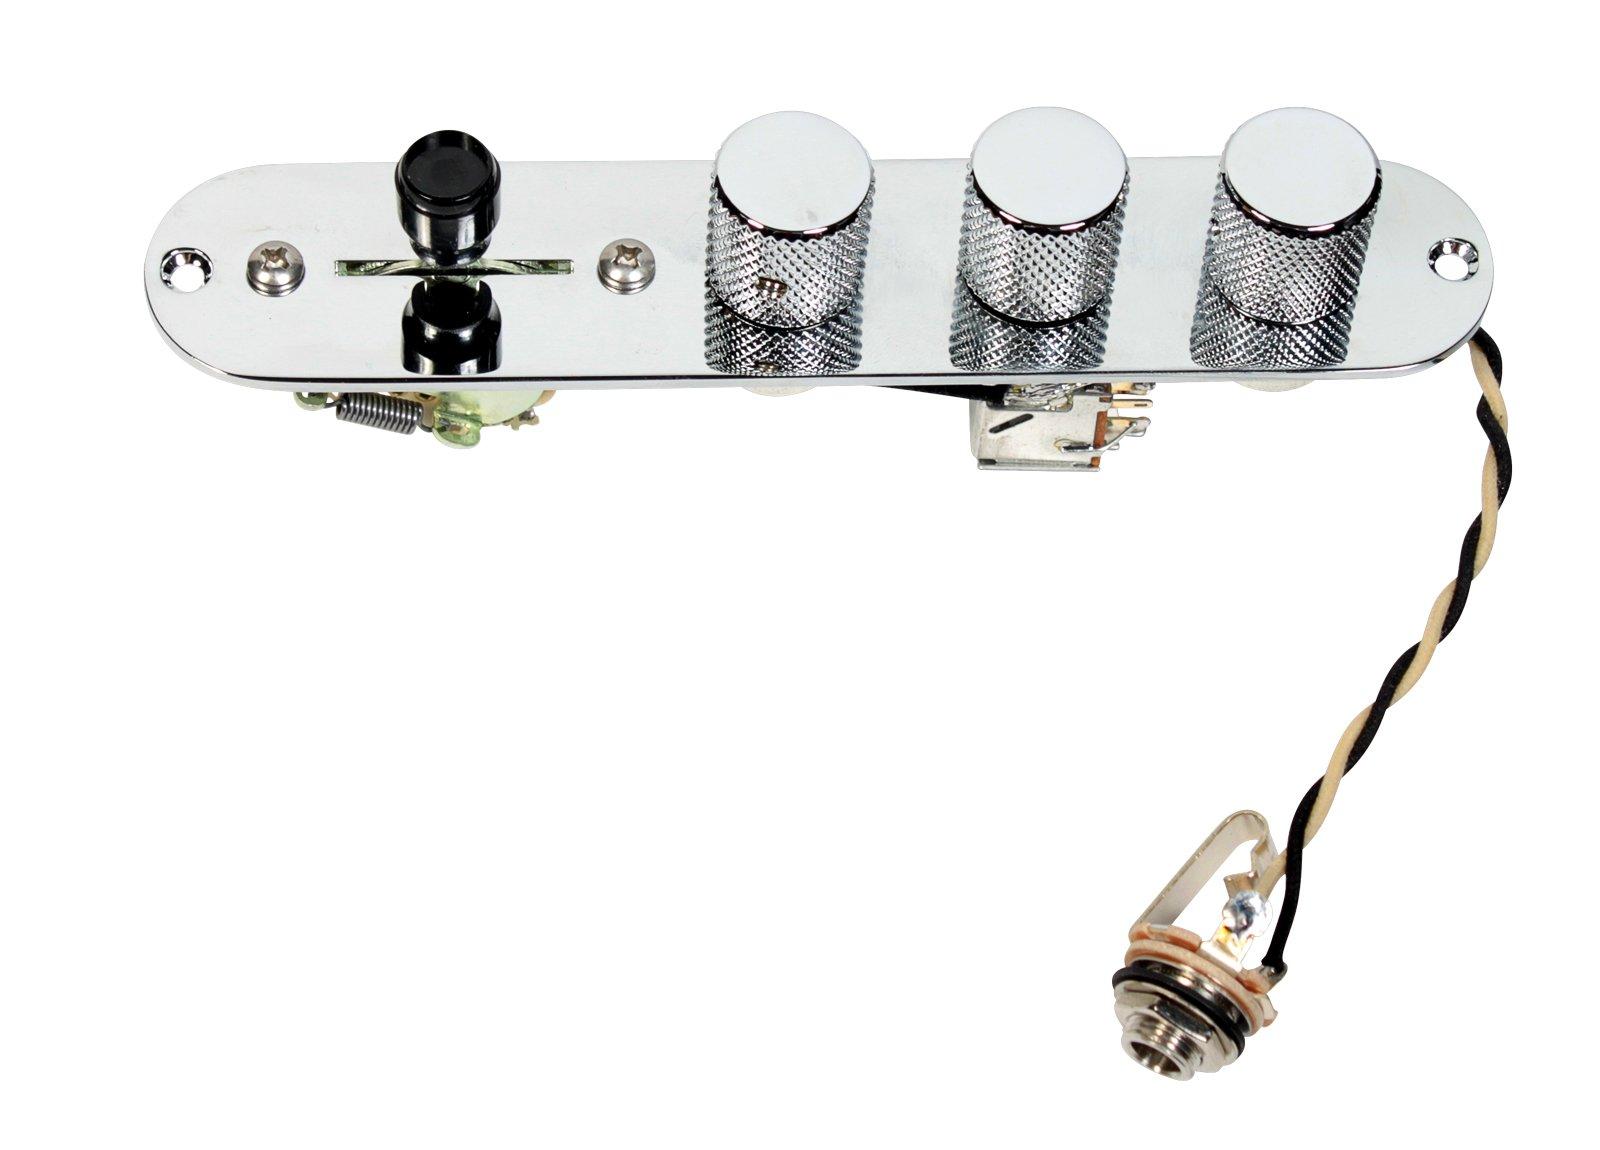 Fender Telecaster Brent Mason Style 3-Way Control Plate - Mini Pots - CRL Switch